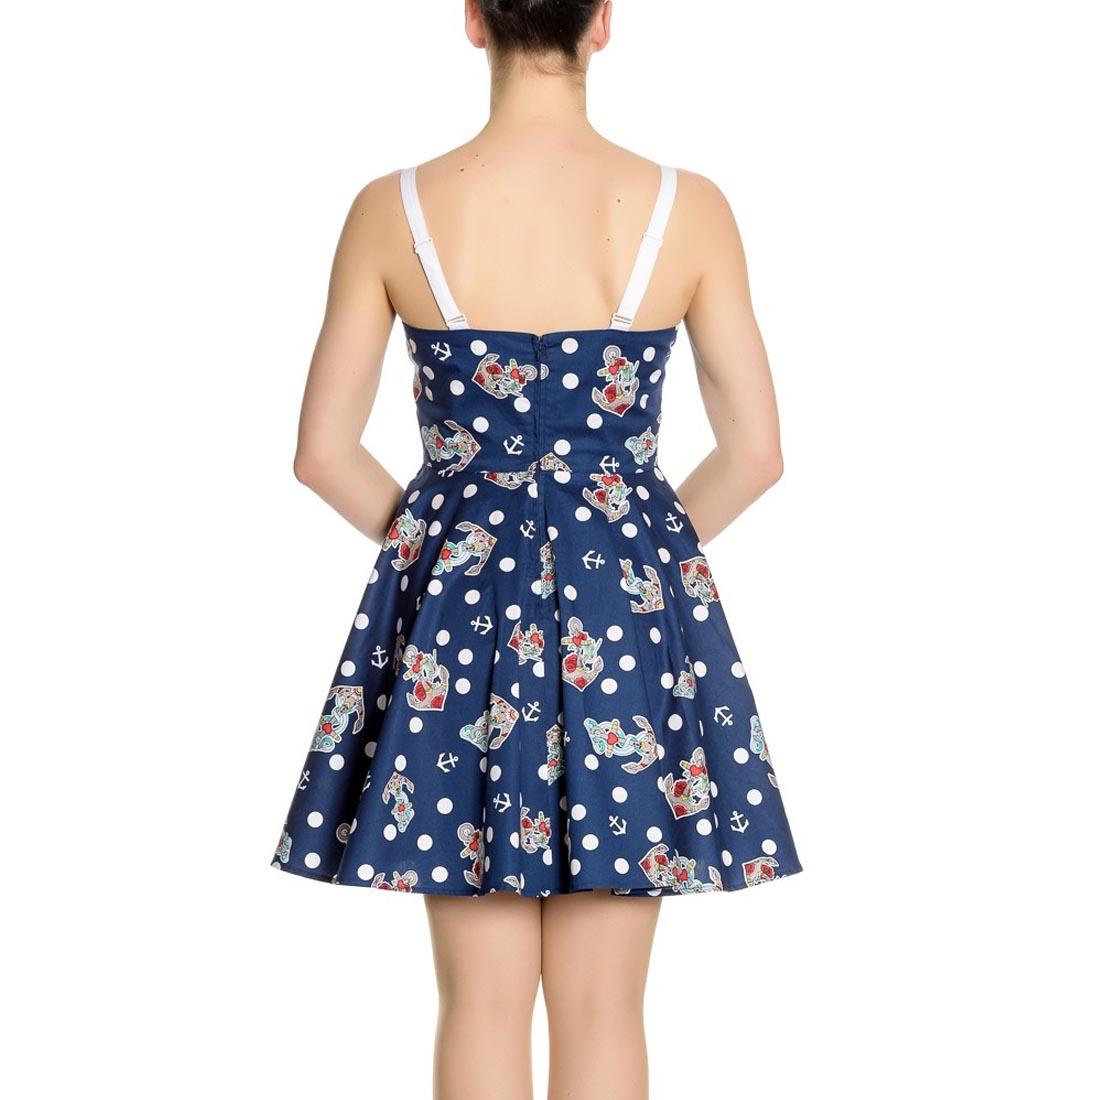 Hell-Bunny-Navy-Blue-50s-Nautical-Mini-Dress-OCEANA-Polka-Dot-All-Sizes thumbnail 25